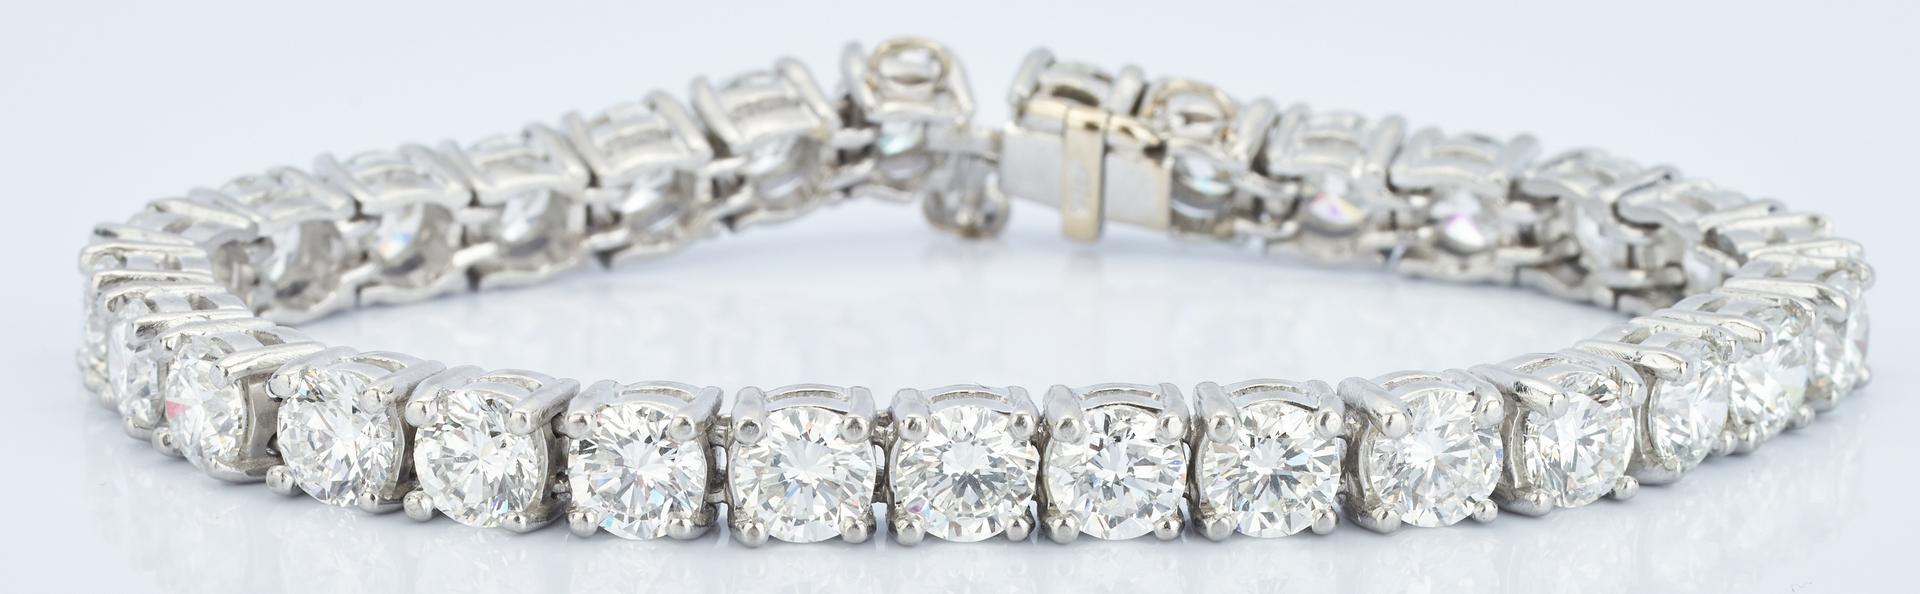 Lot 38: Platinum Diamond Tennis Bracelet, 13 CTW